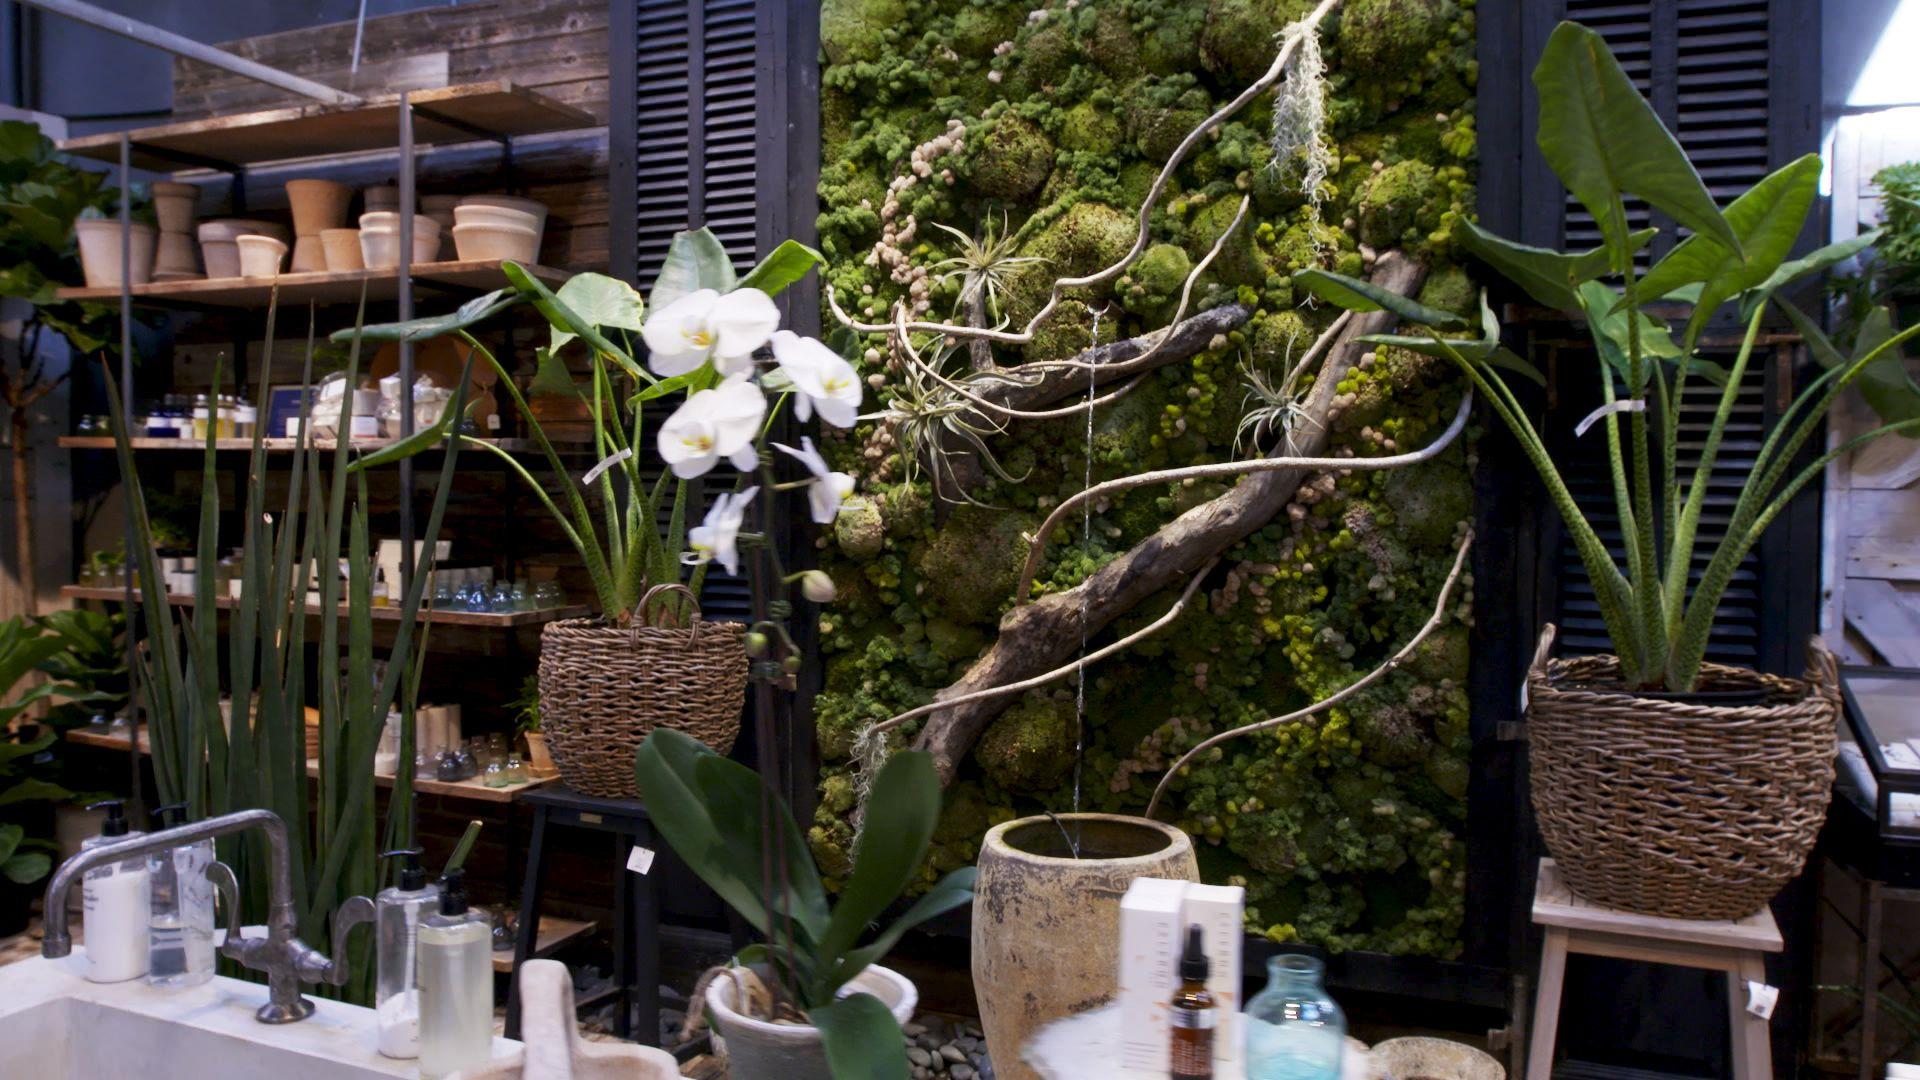 Terrain's Westport Store Is Basically Plant Heaven